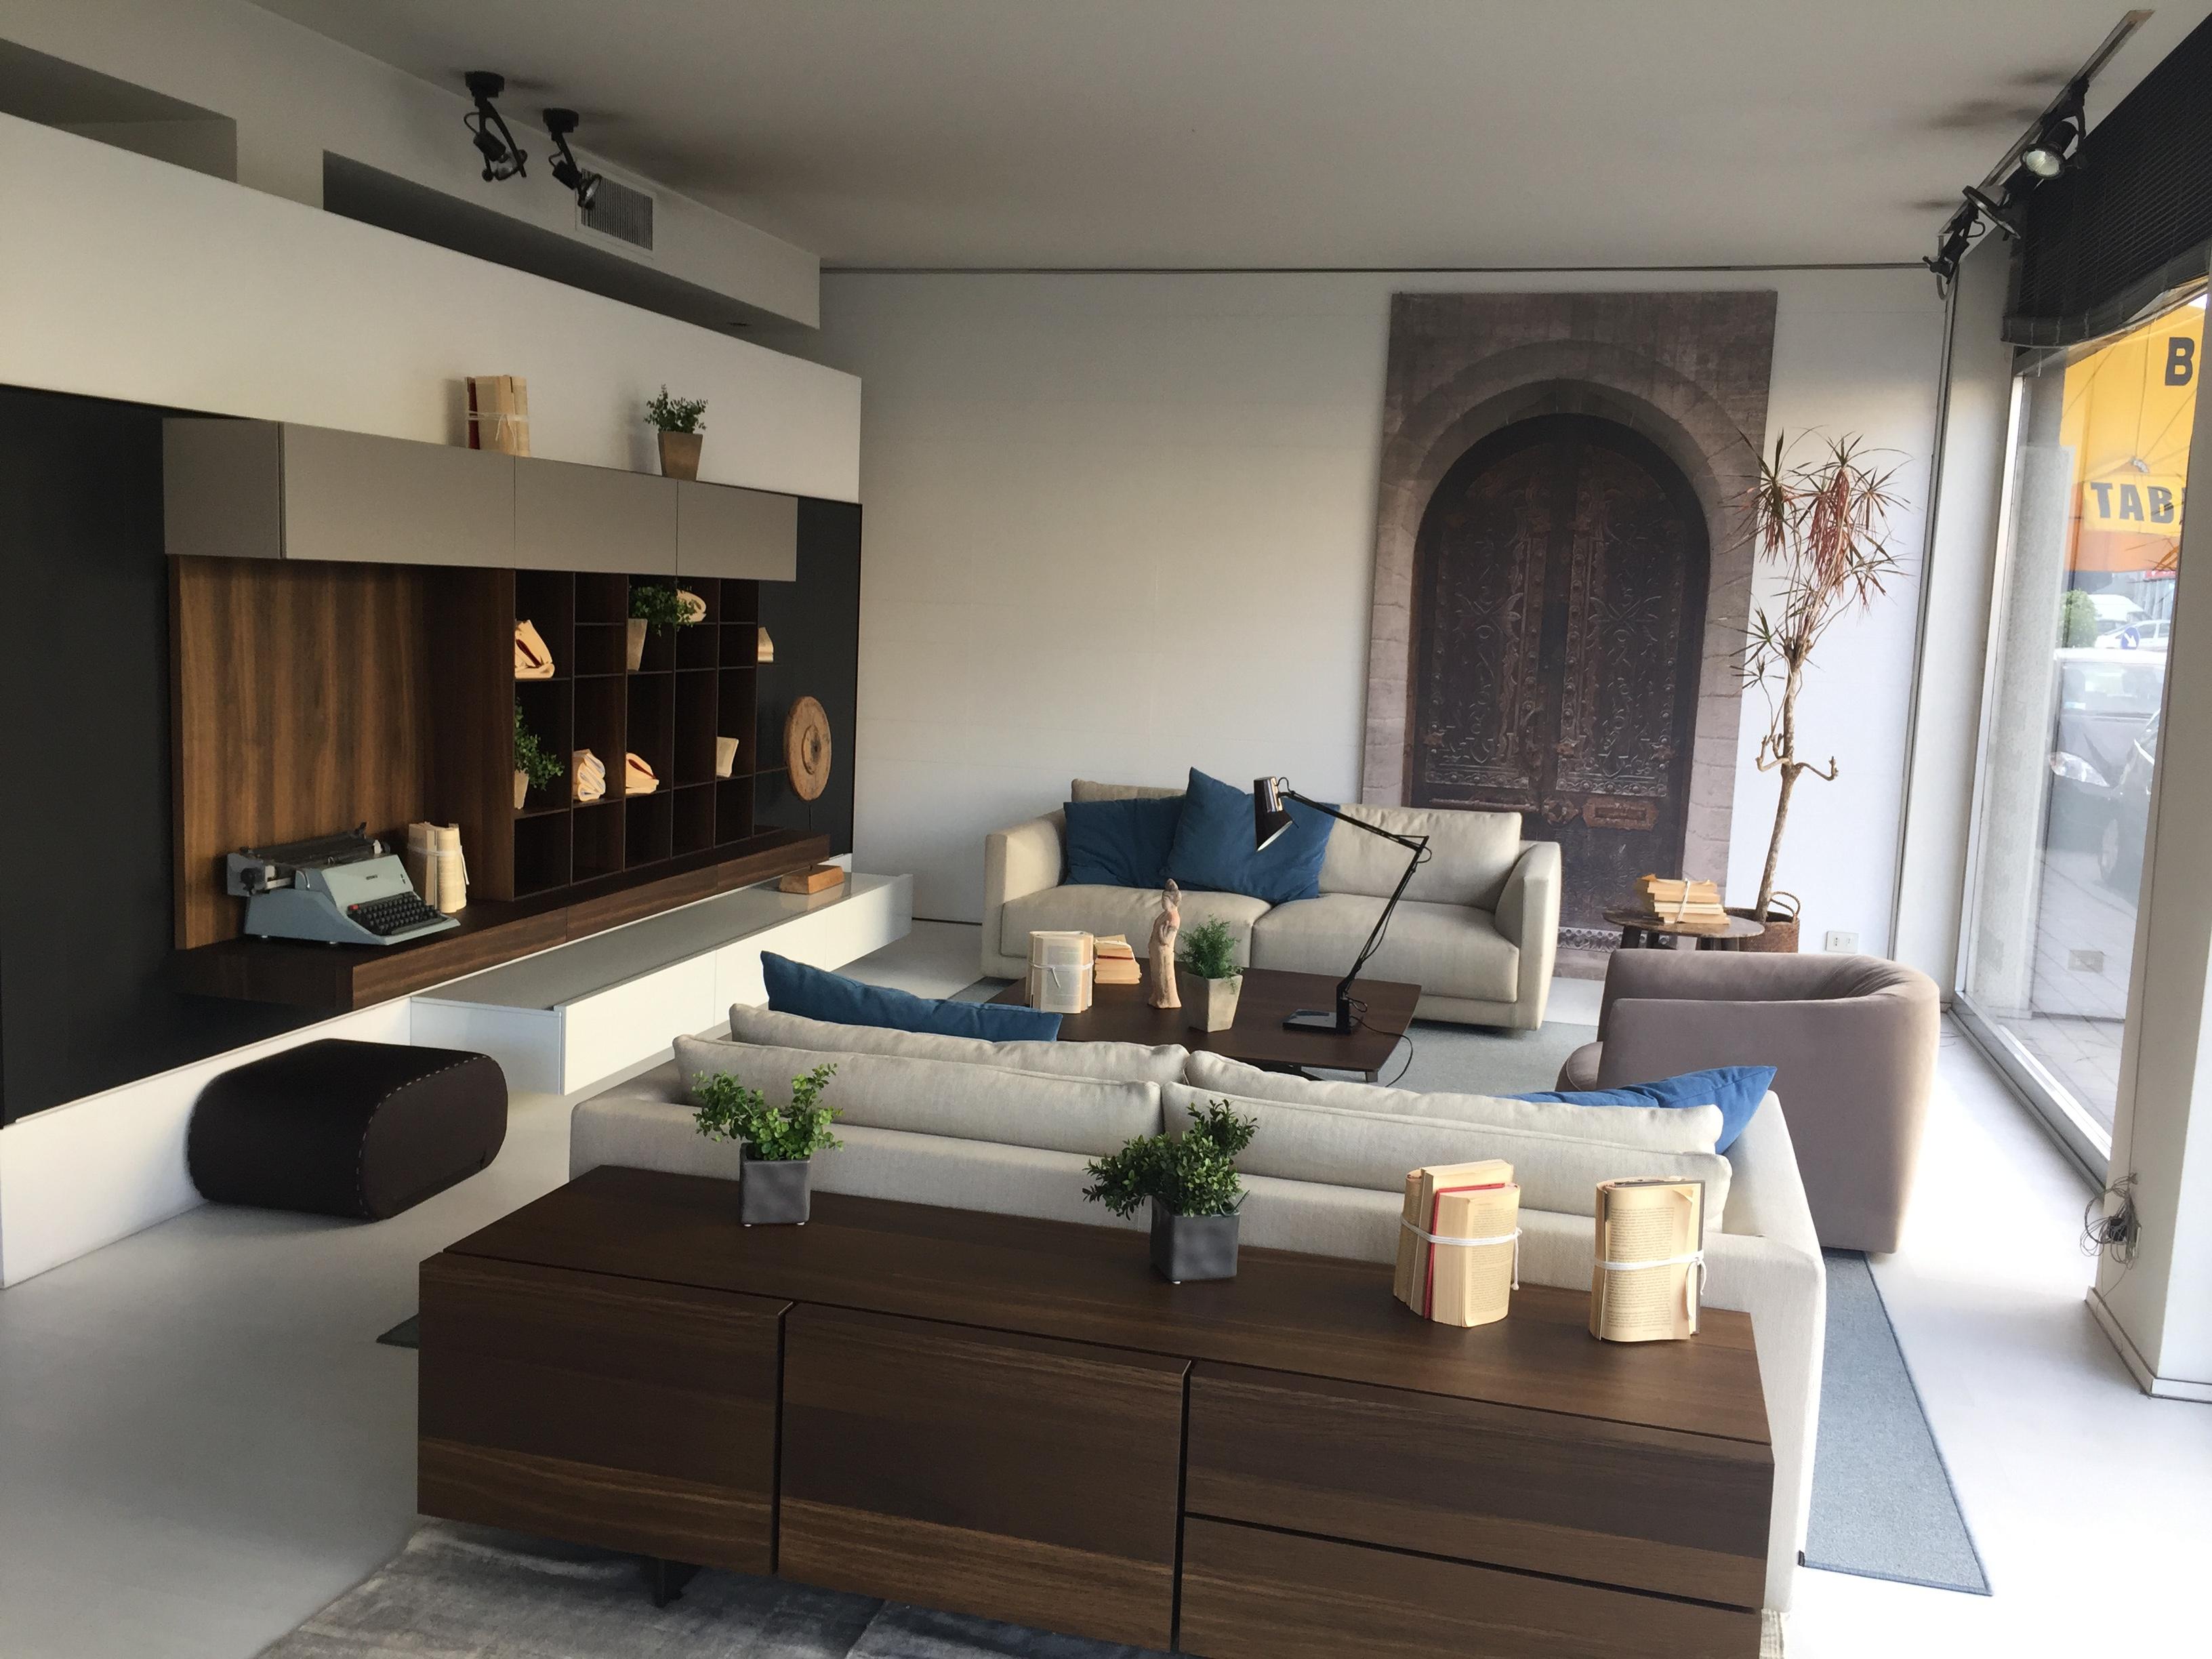 Divani poliform bristol habitat casa for Divani poliform outlet